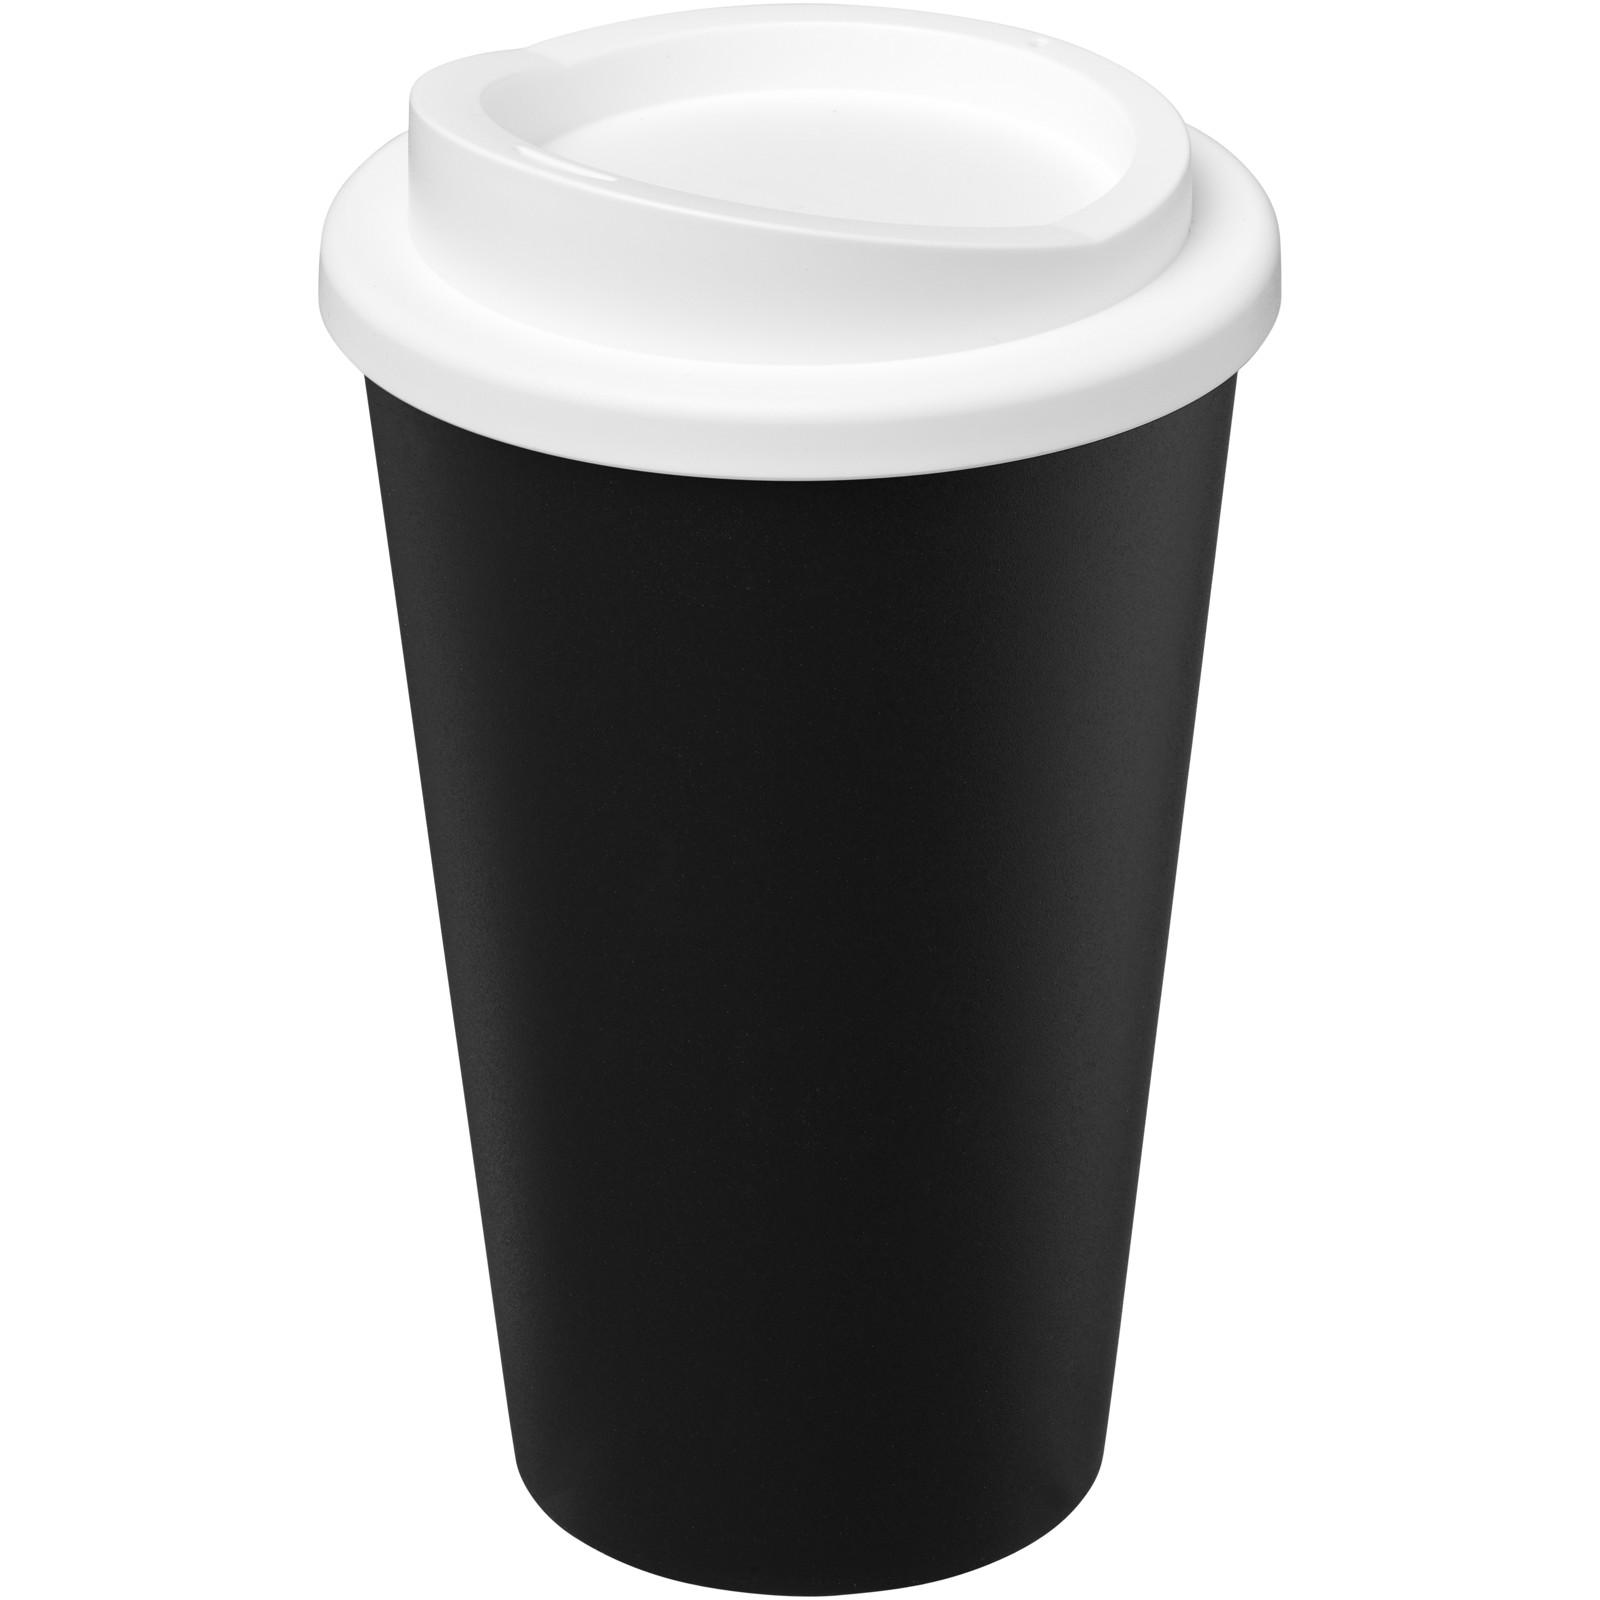 Americano Eco 350 ml recycled tumbler - Solid Black / White